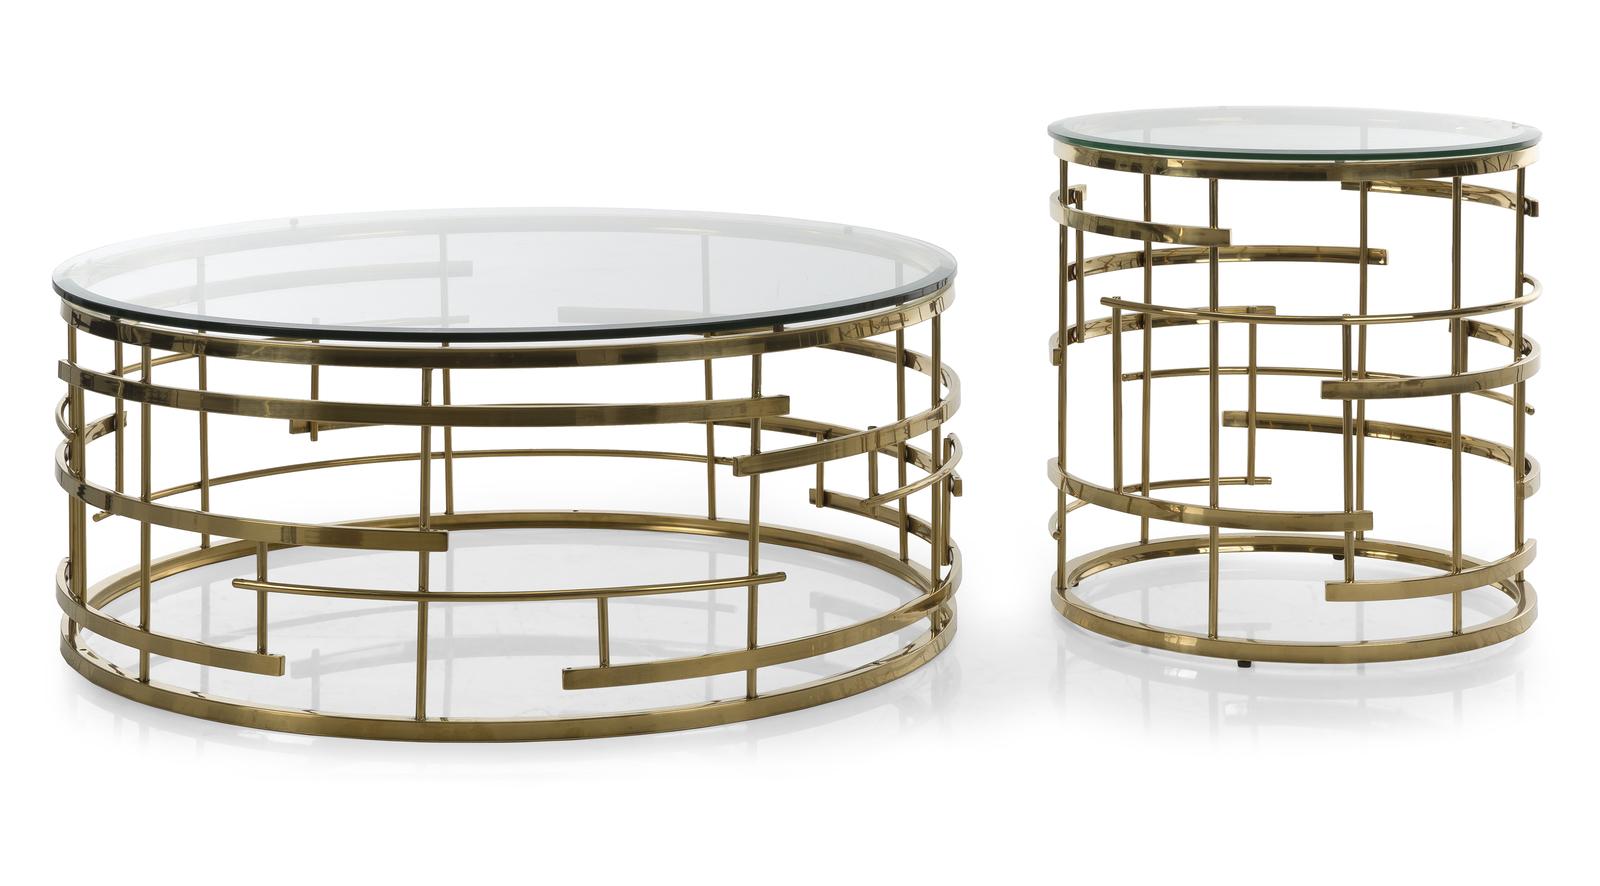 Dior Tables